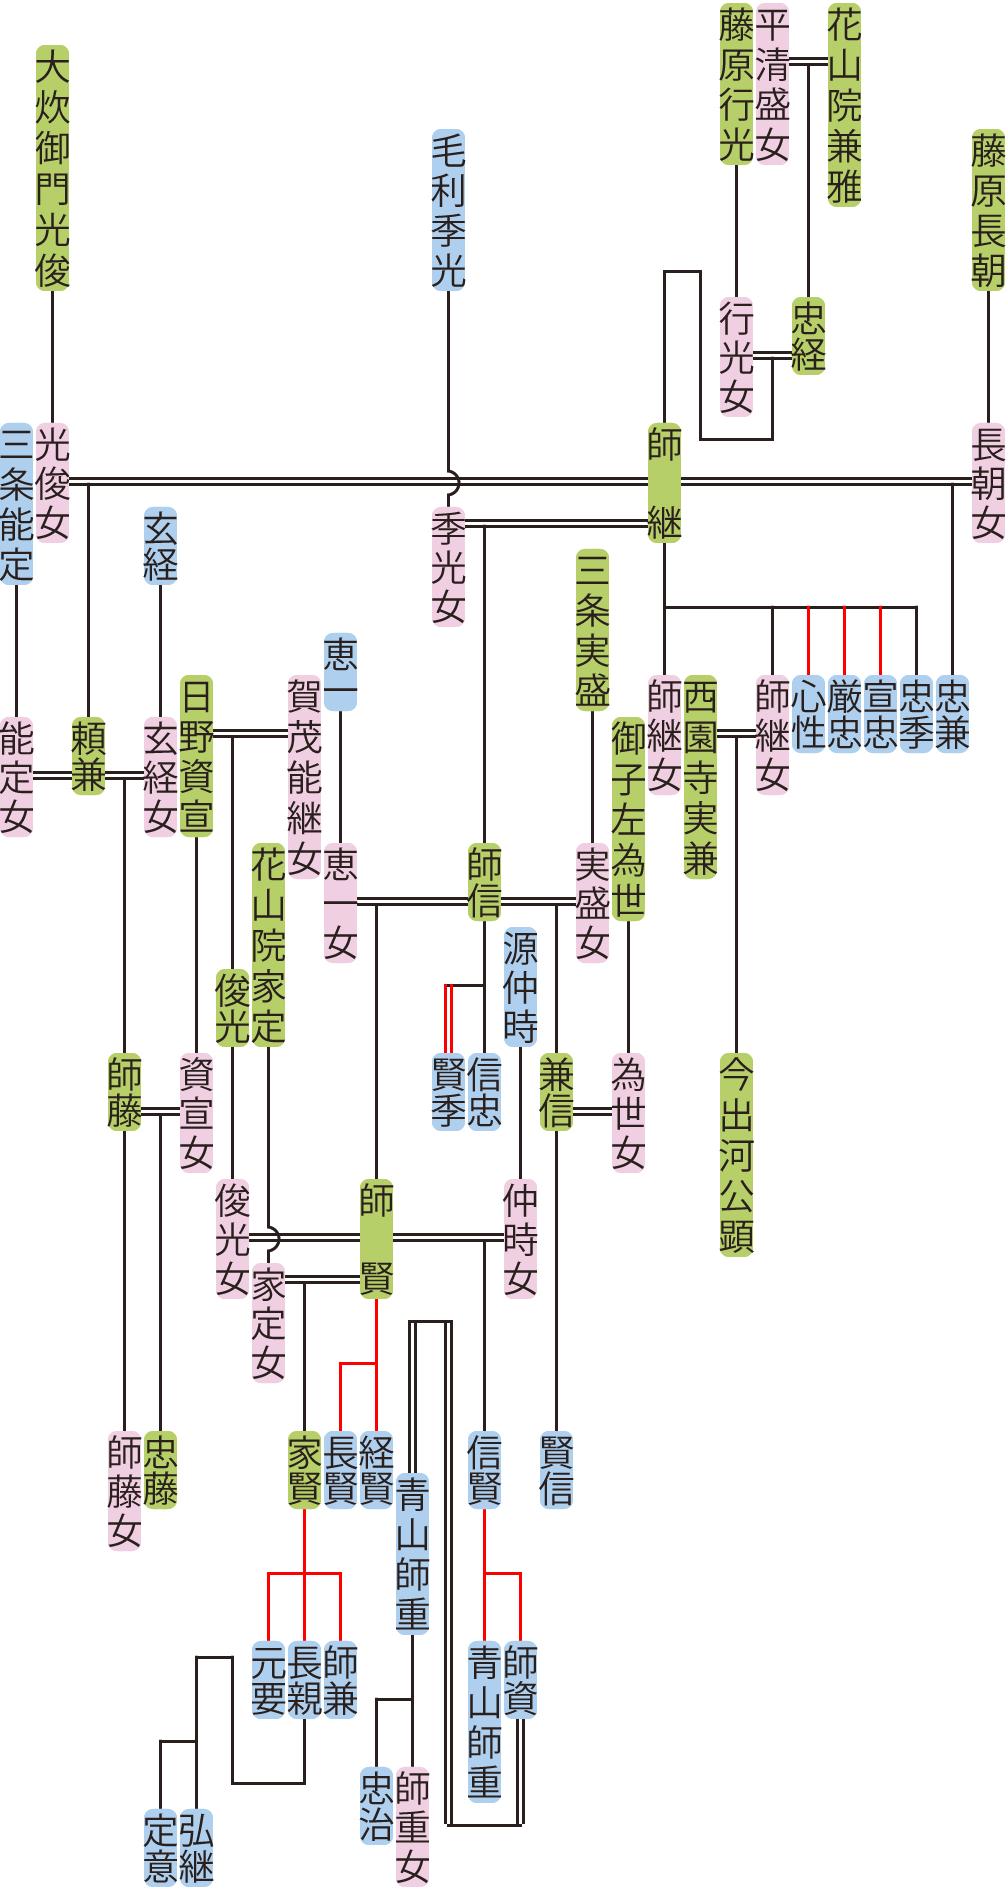 花山院師継~師資の系図